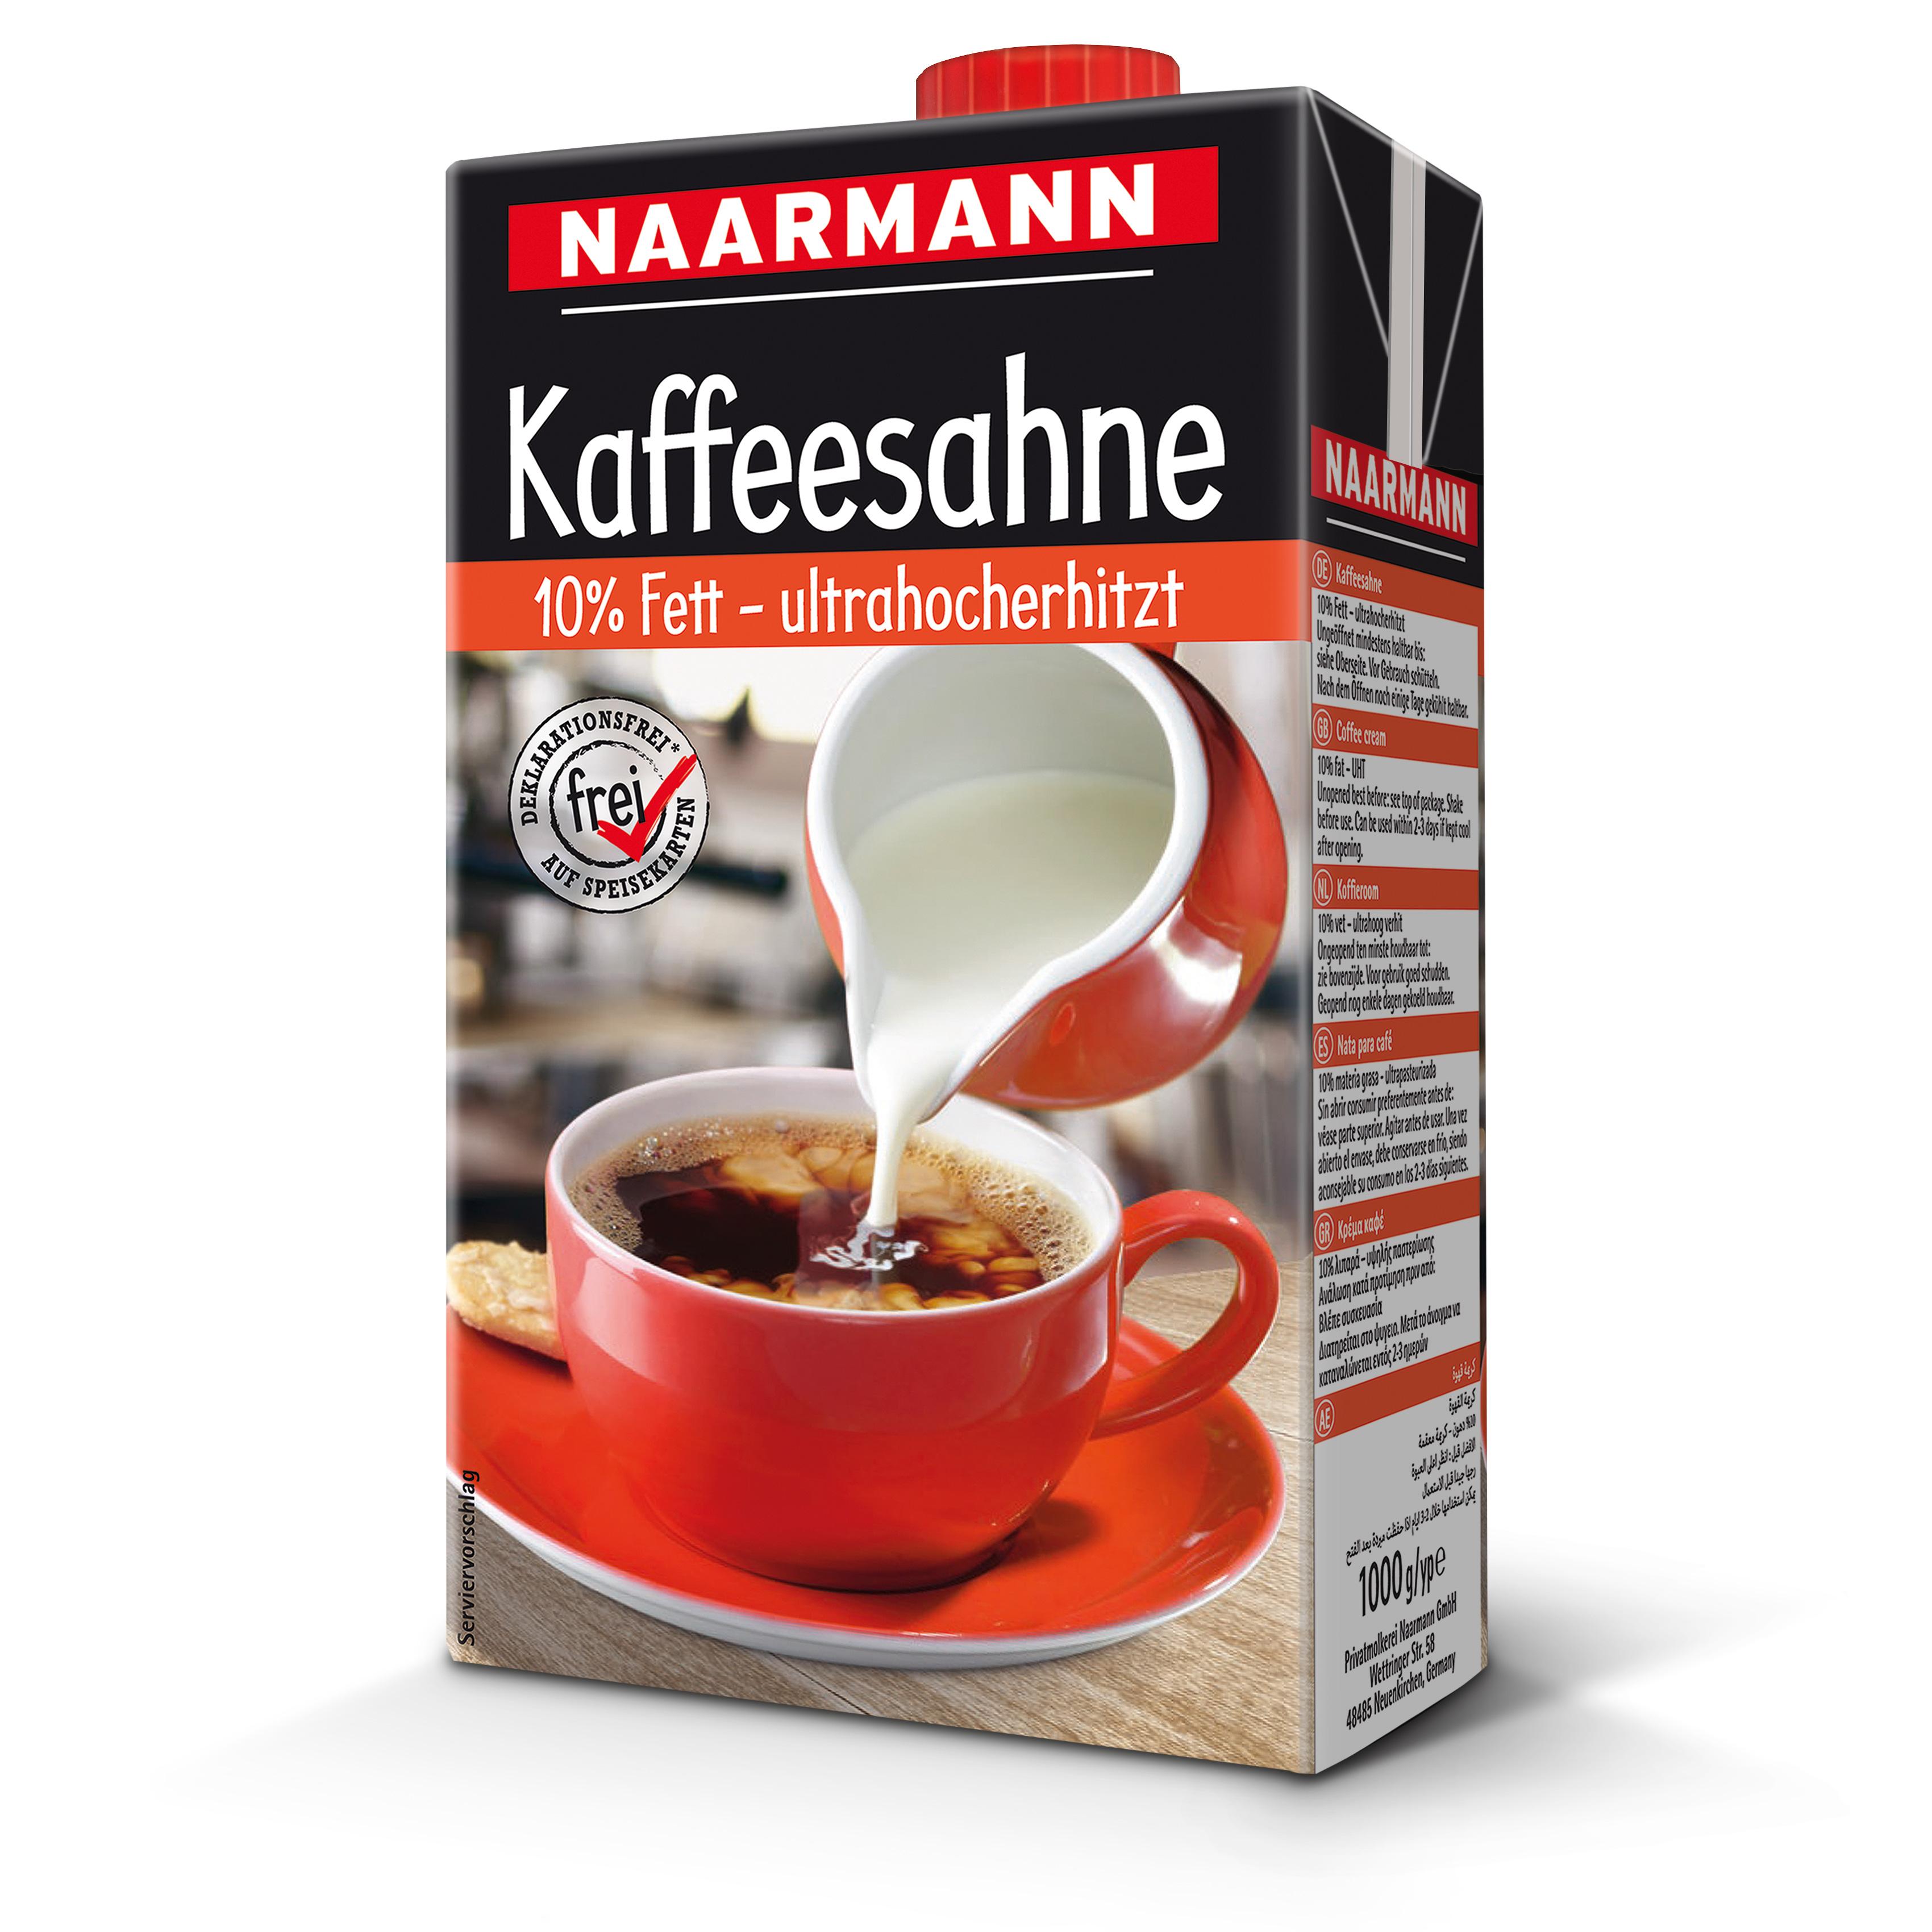 Naarmann Kaffeesahne 10% Fett 1000 g